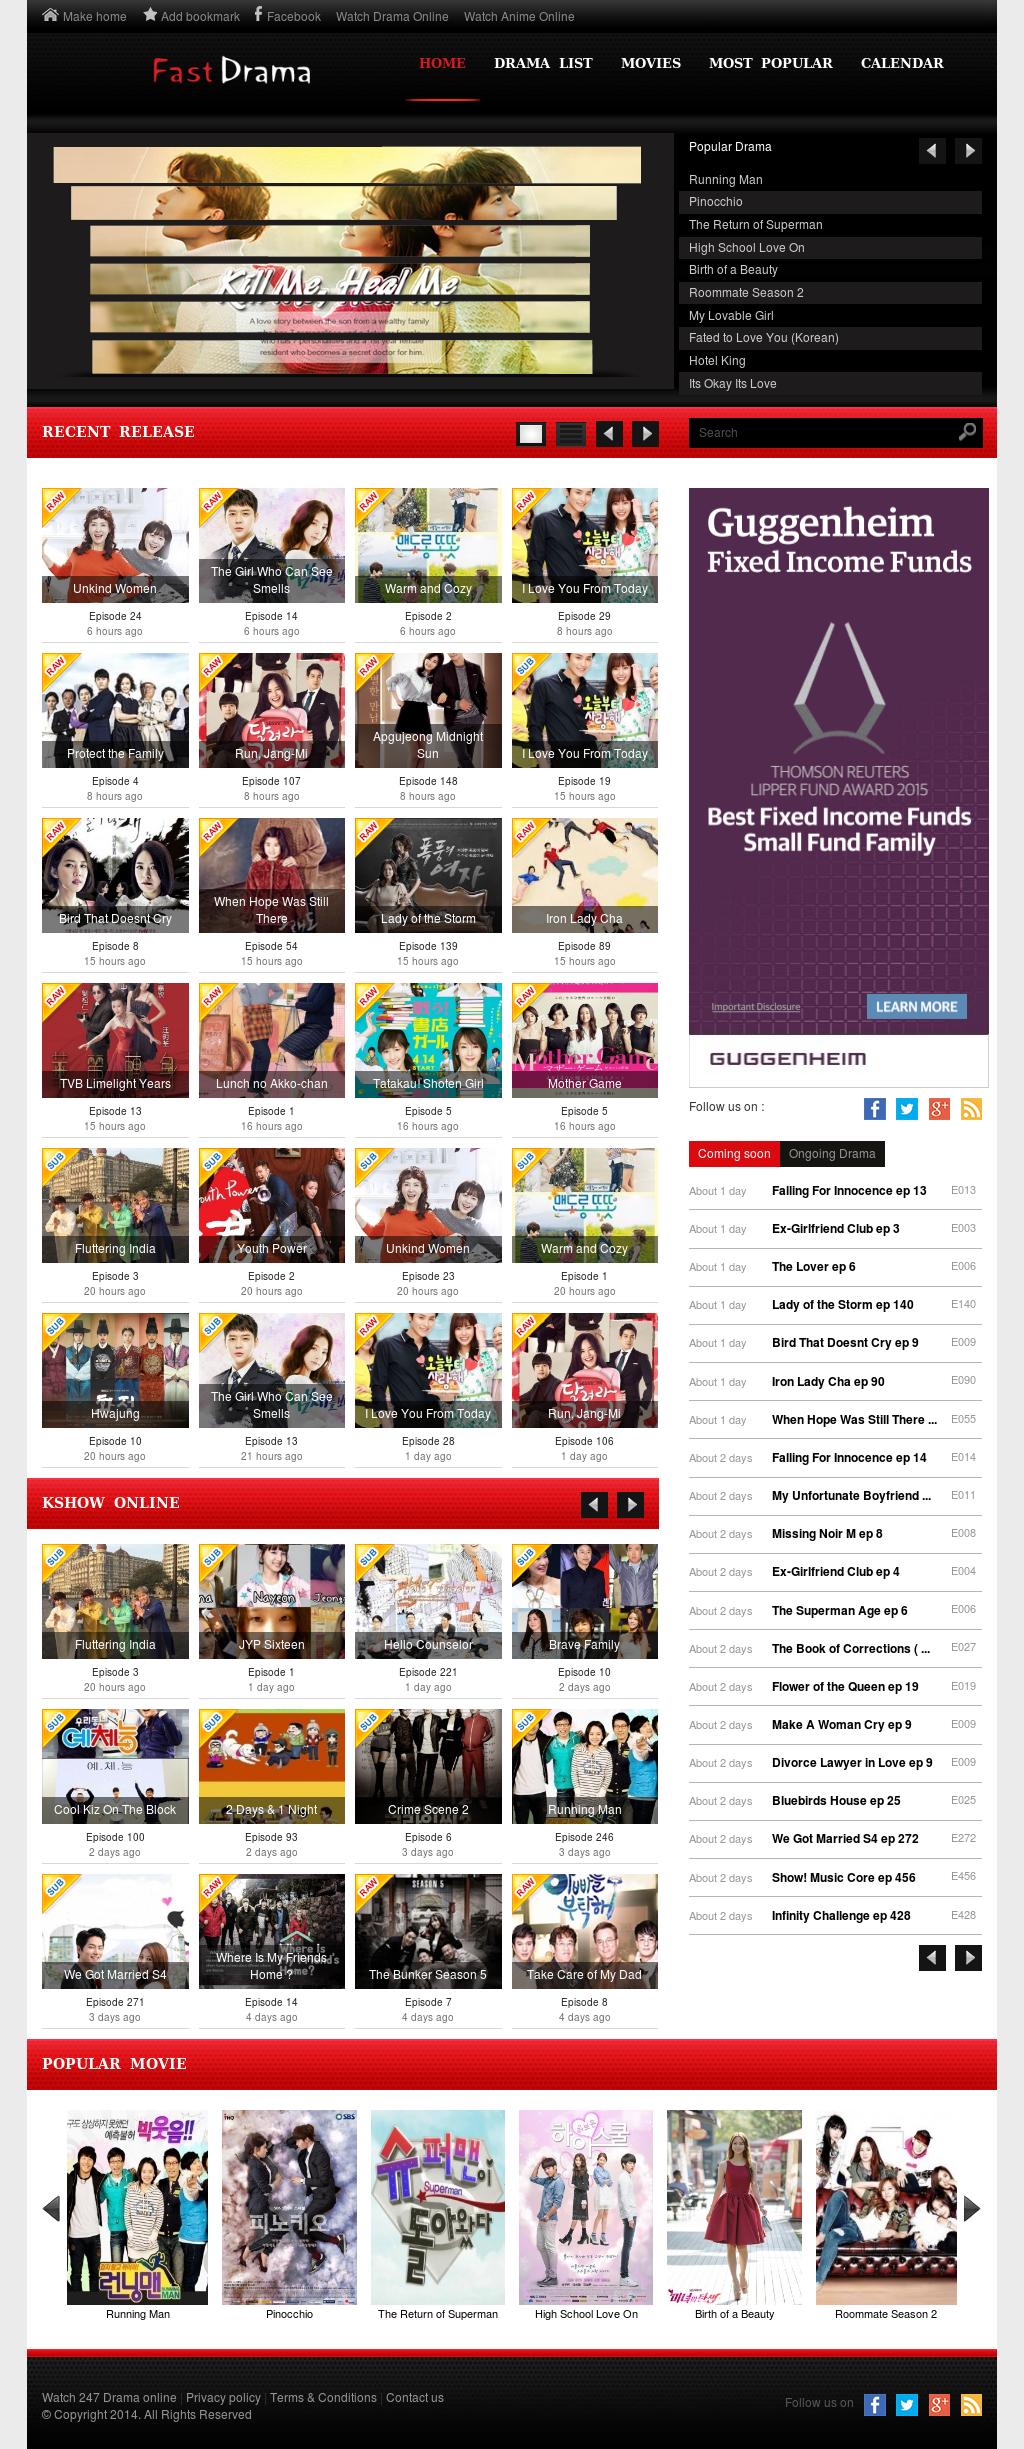 100 Brands – Top Fastdrama co